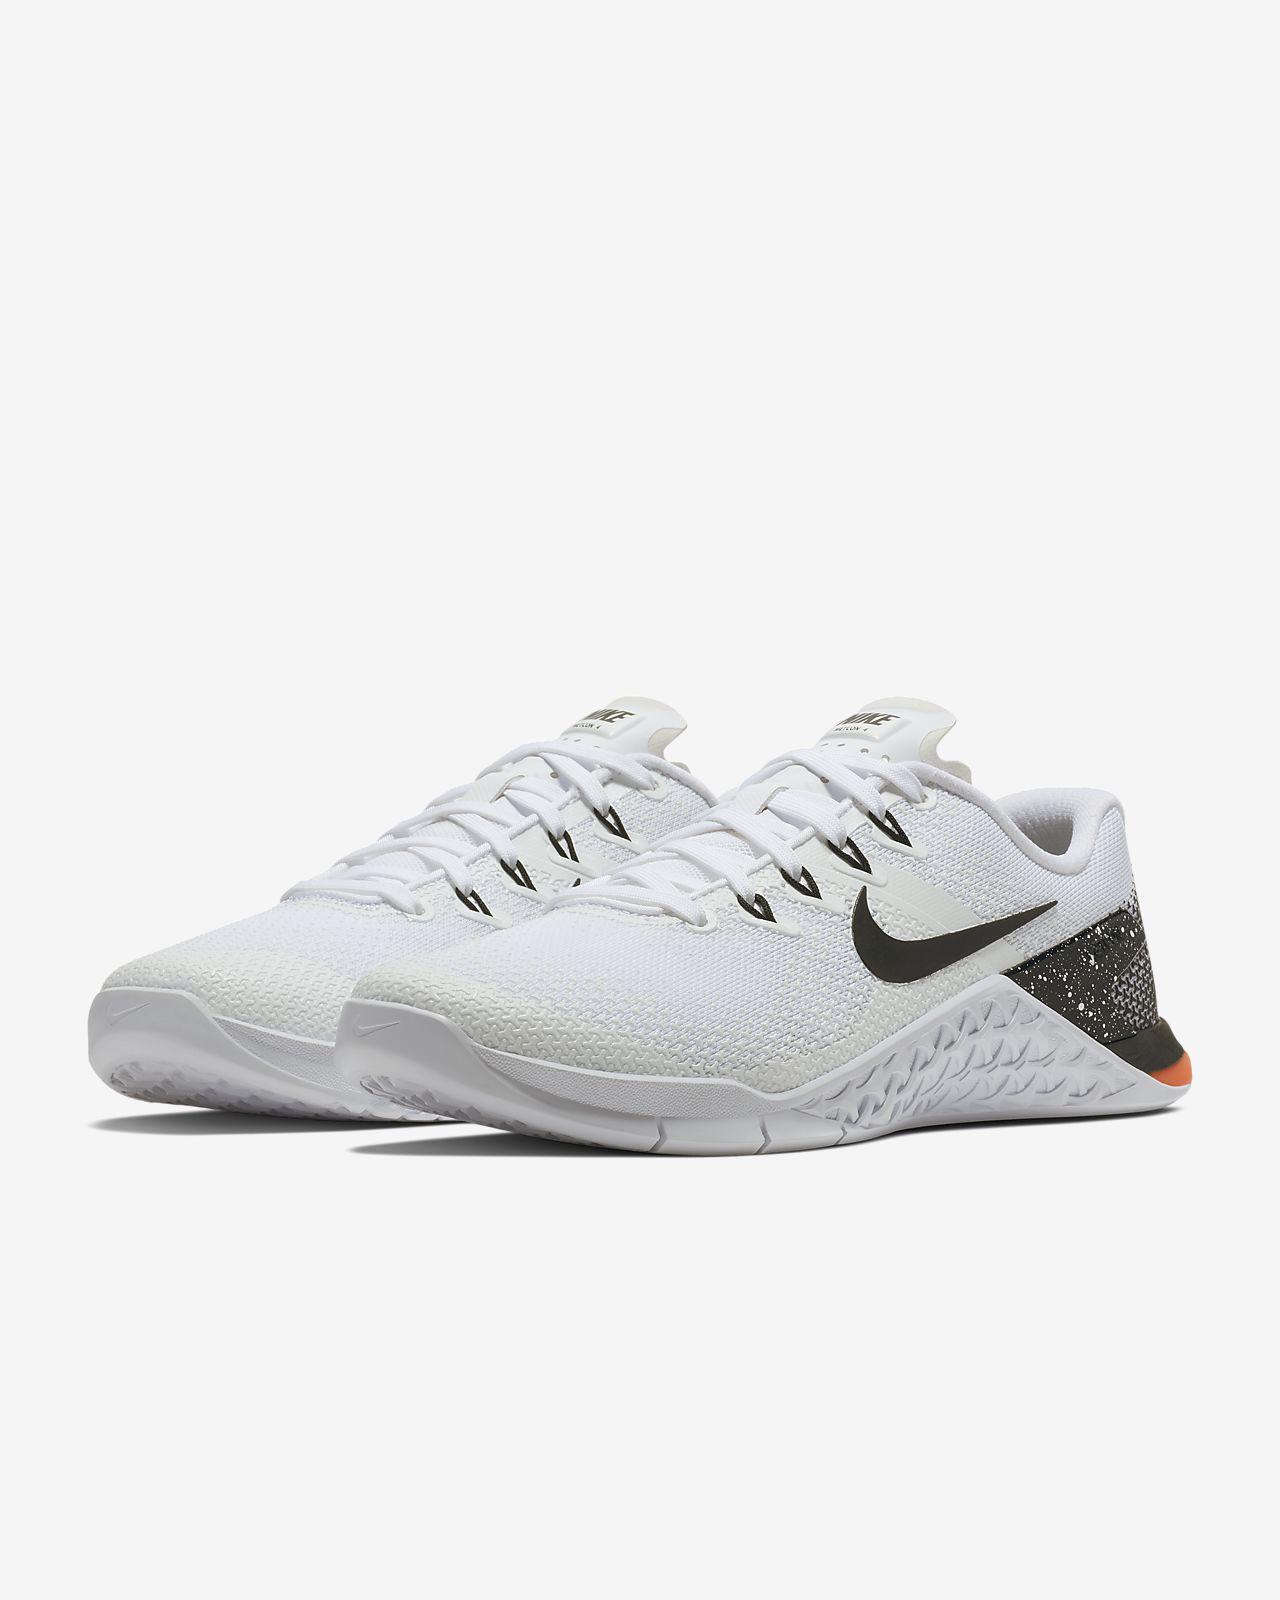 Nike Metcon Mujer